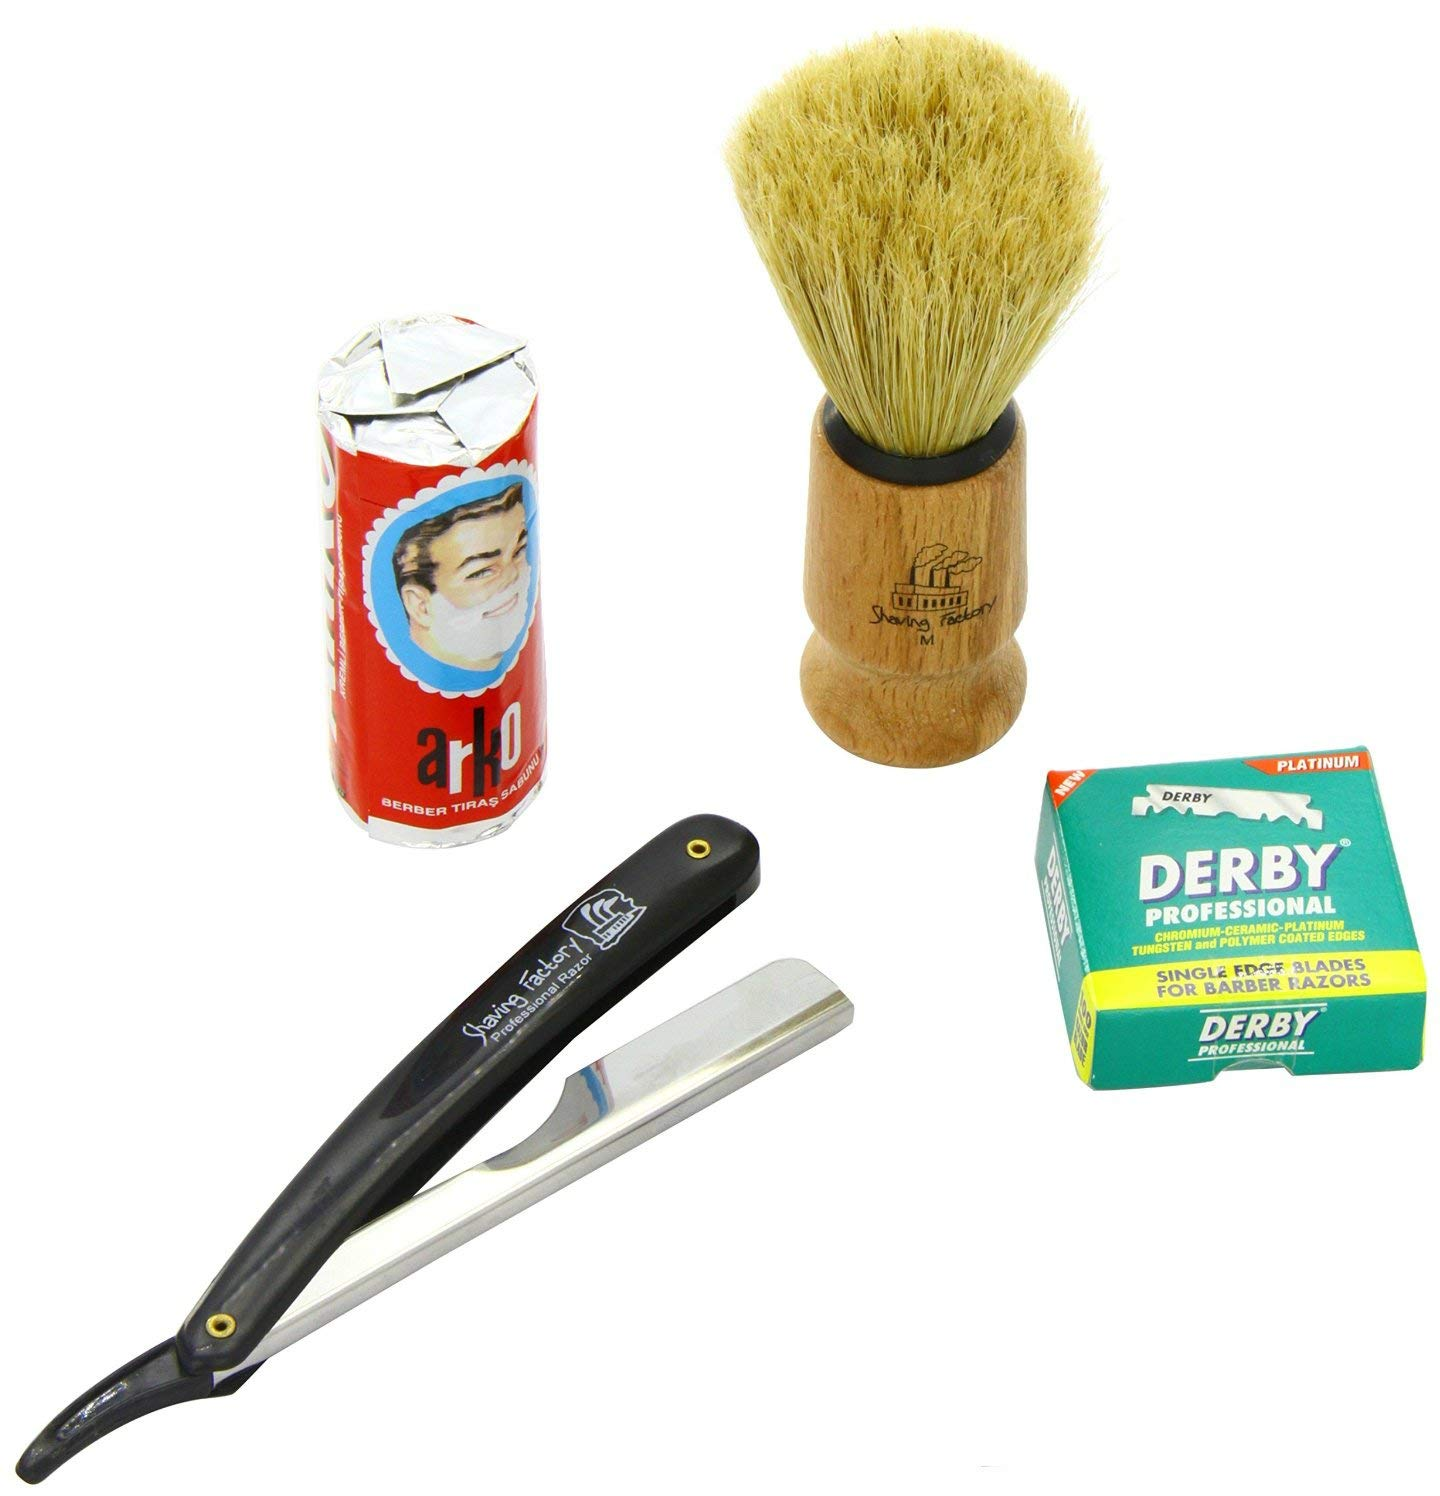 SF228-Shaving Factory Straight Razor (Black), Shaving Factory Hand Made Shaving Brush, 100 Derby Professional Single Edge Razor Blades and Arko Shaving Soap Stick. Great Valentines Day Gift Set For Men.